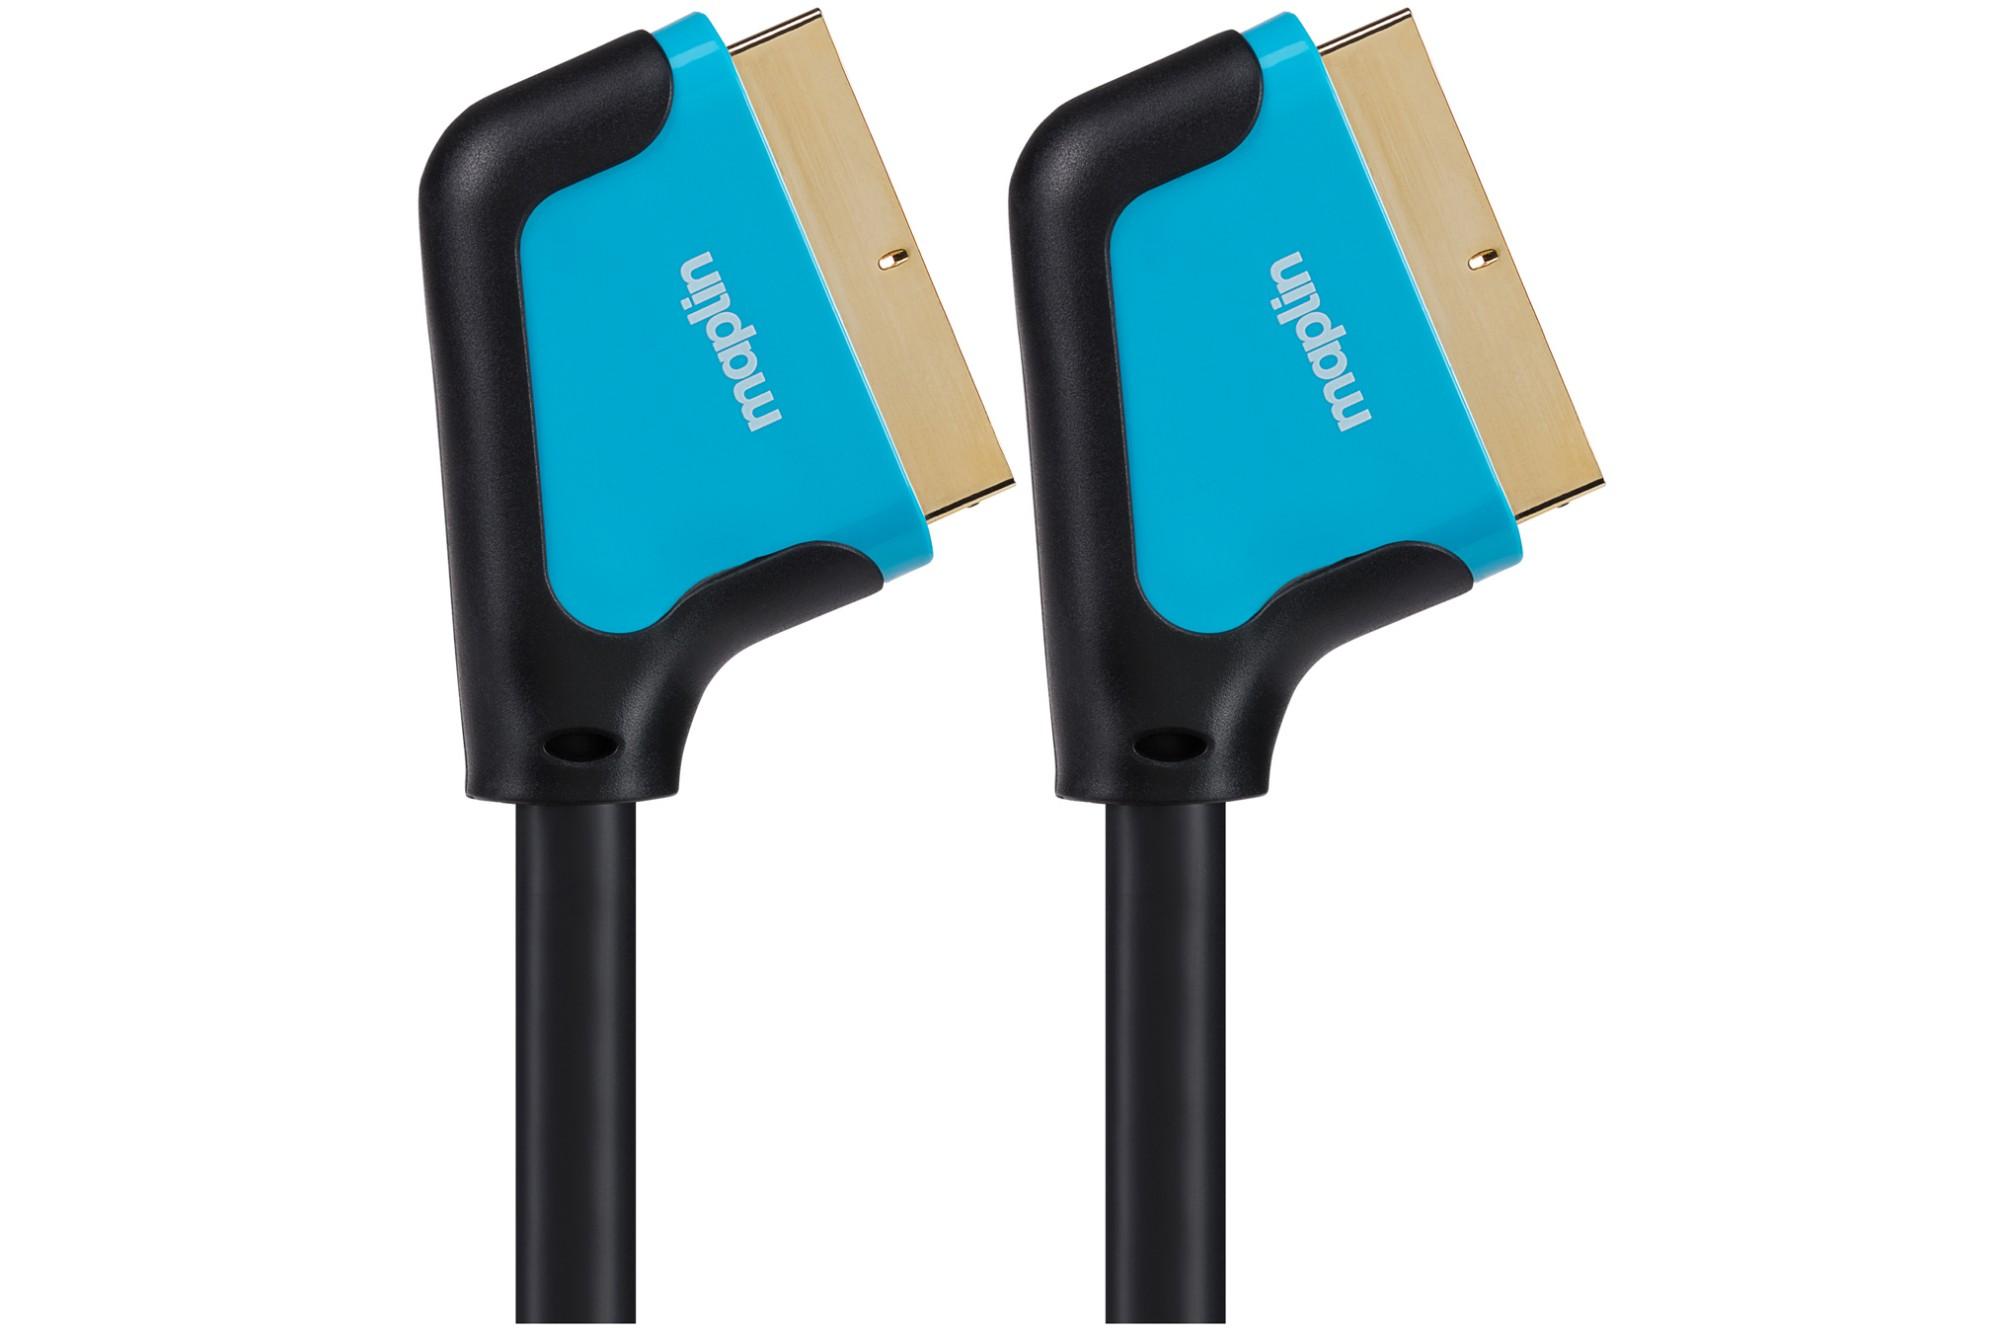 MAPLIN Premium 21 Pin Connector SCART Cable - Black, 3m